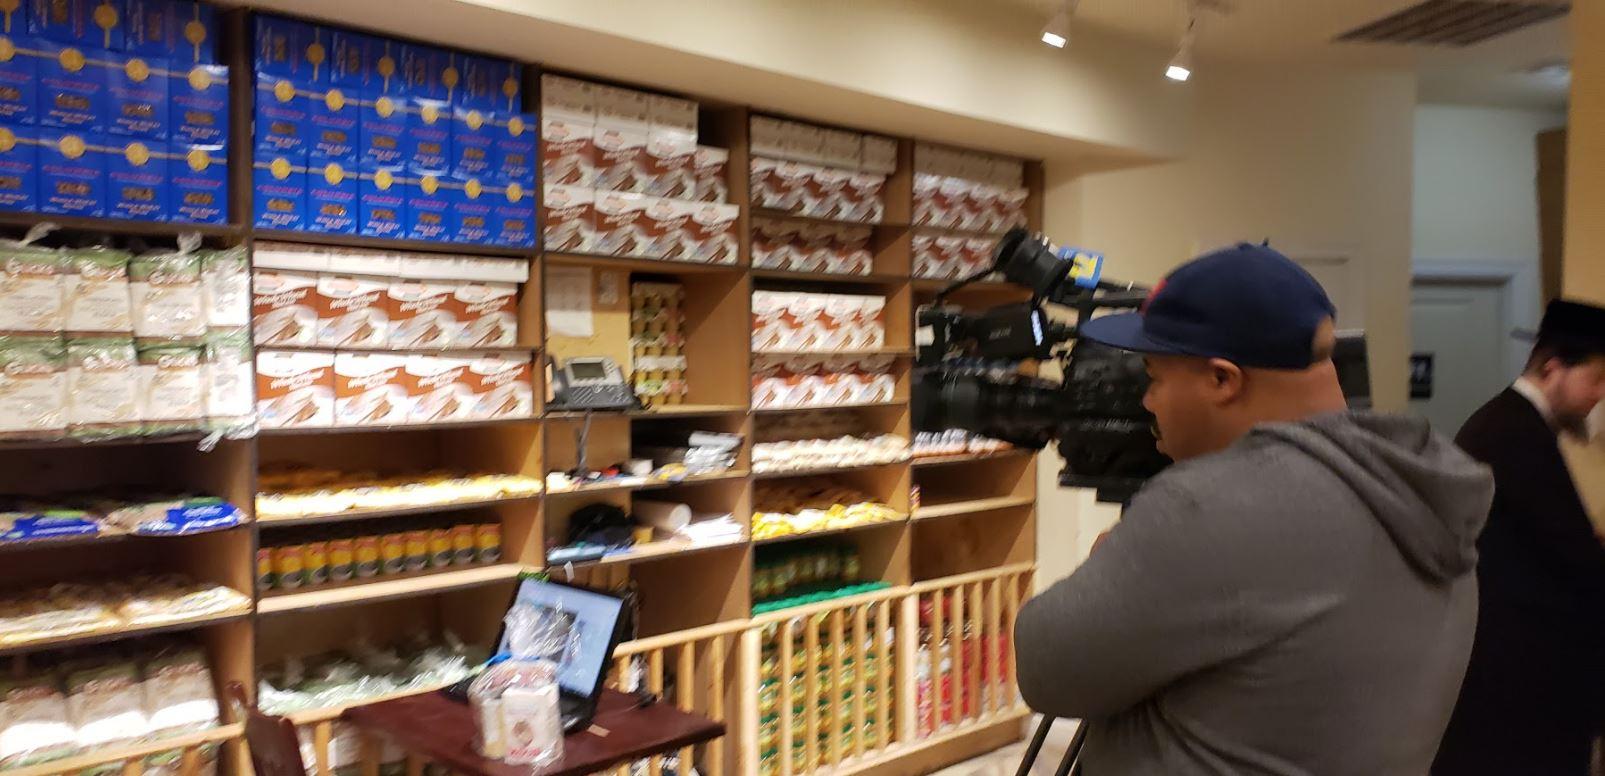 Reporter Christian L Braxton of News12 Brooklyn at Masbia documenting during Purim season